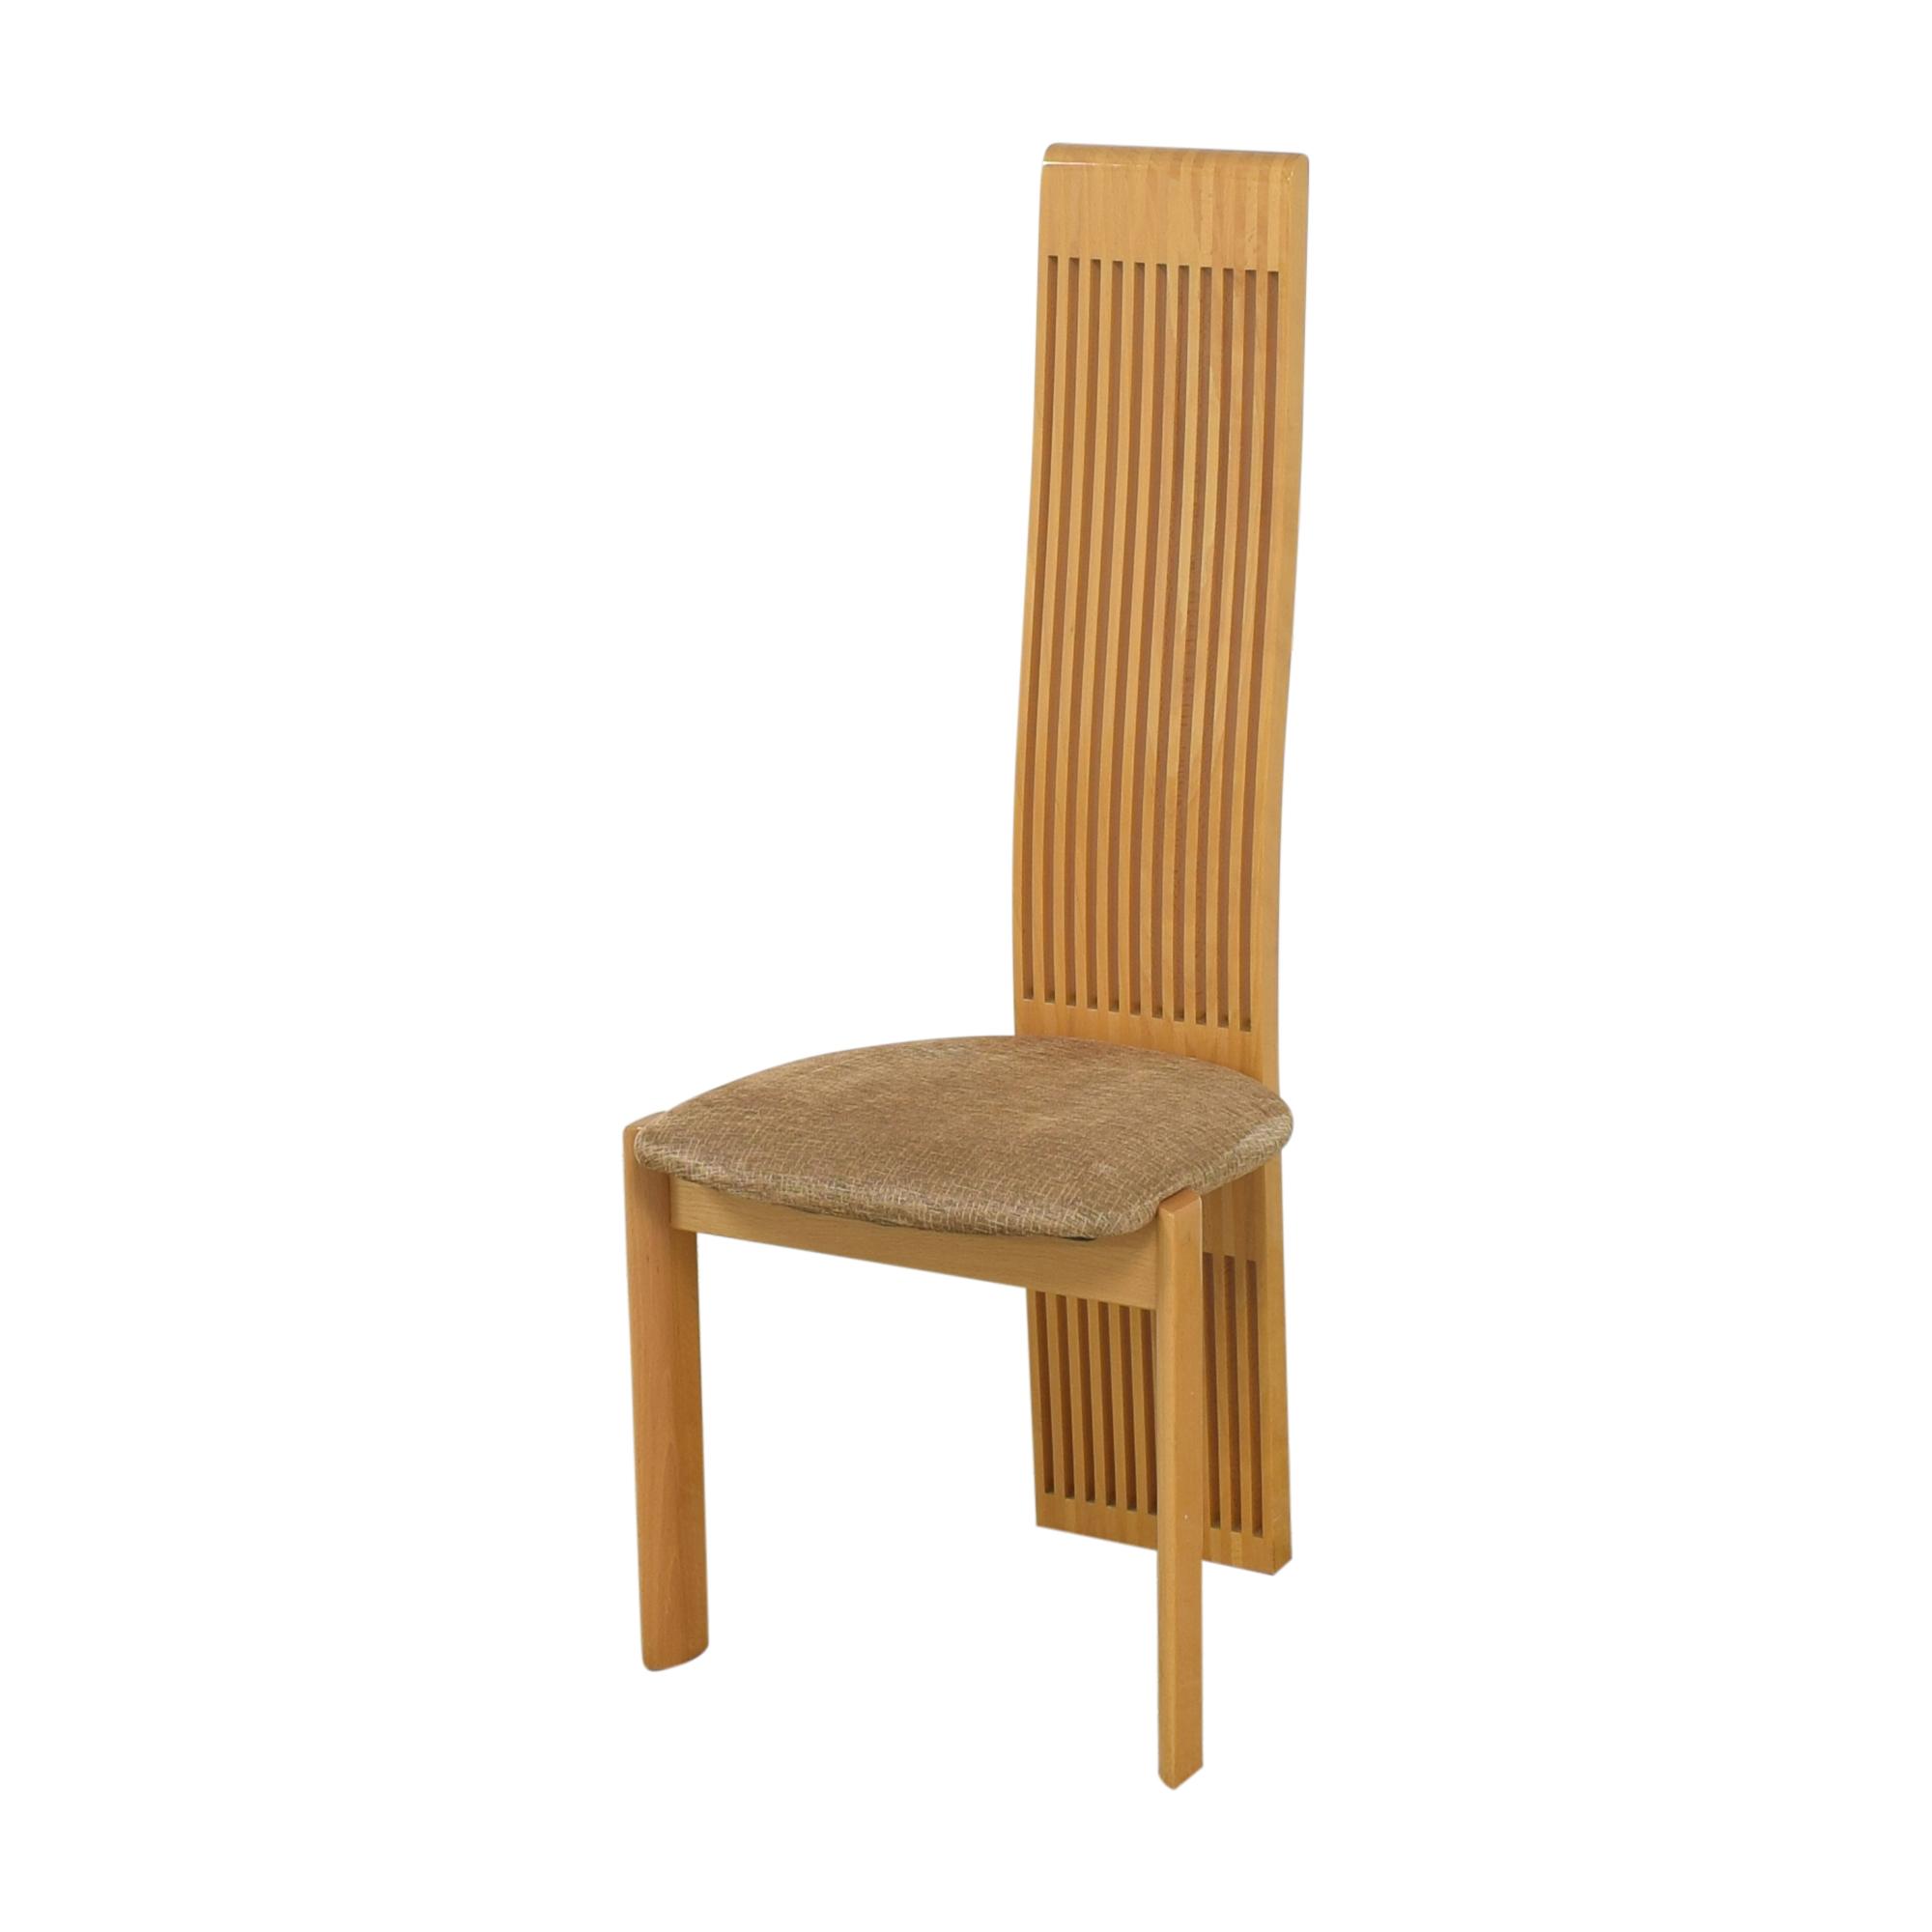 Pietro Costantini Pietro Costantini High Back Dining Chairs ma